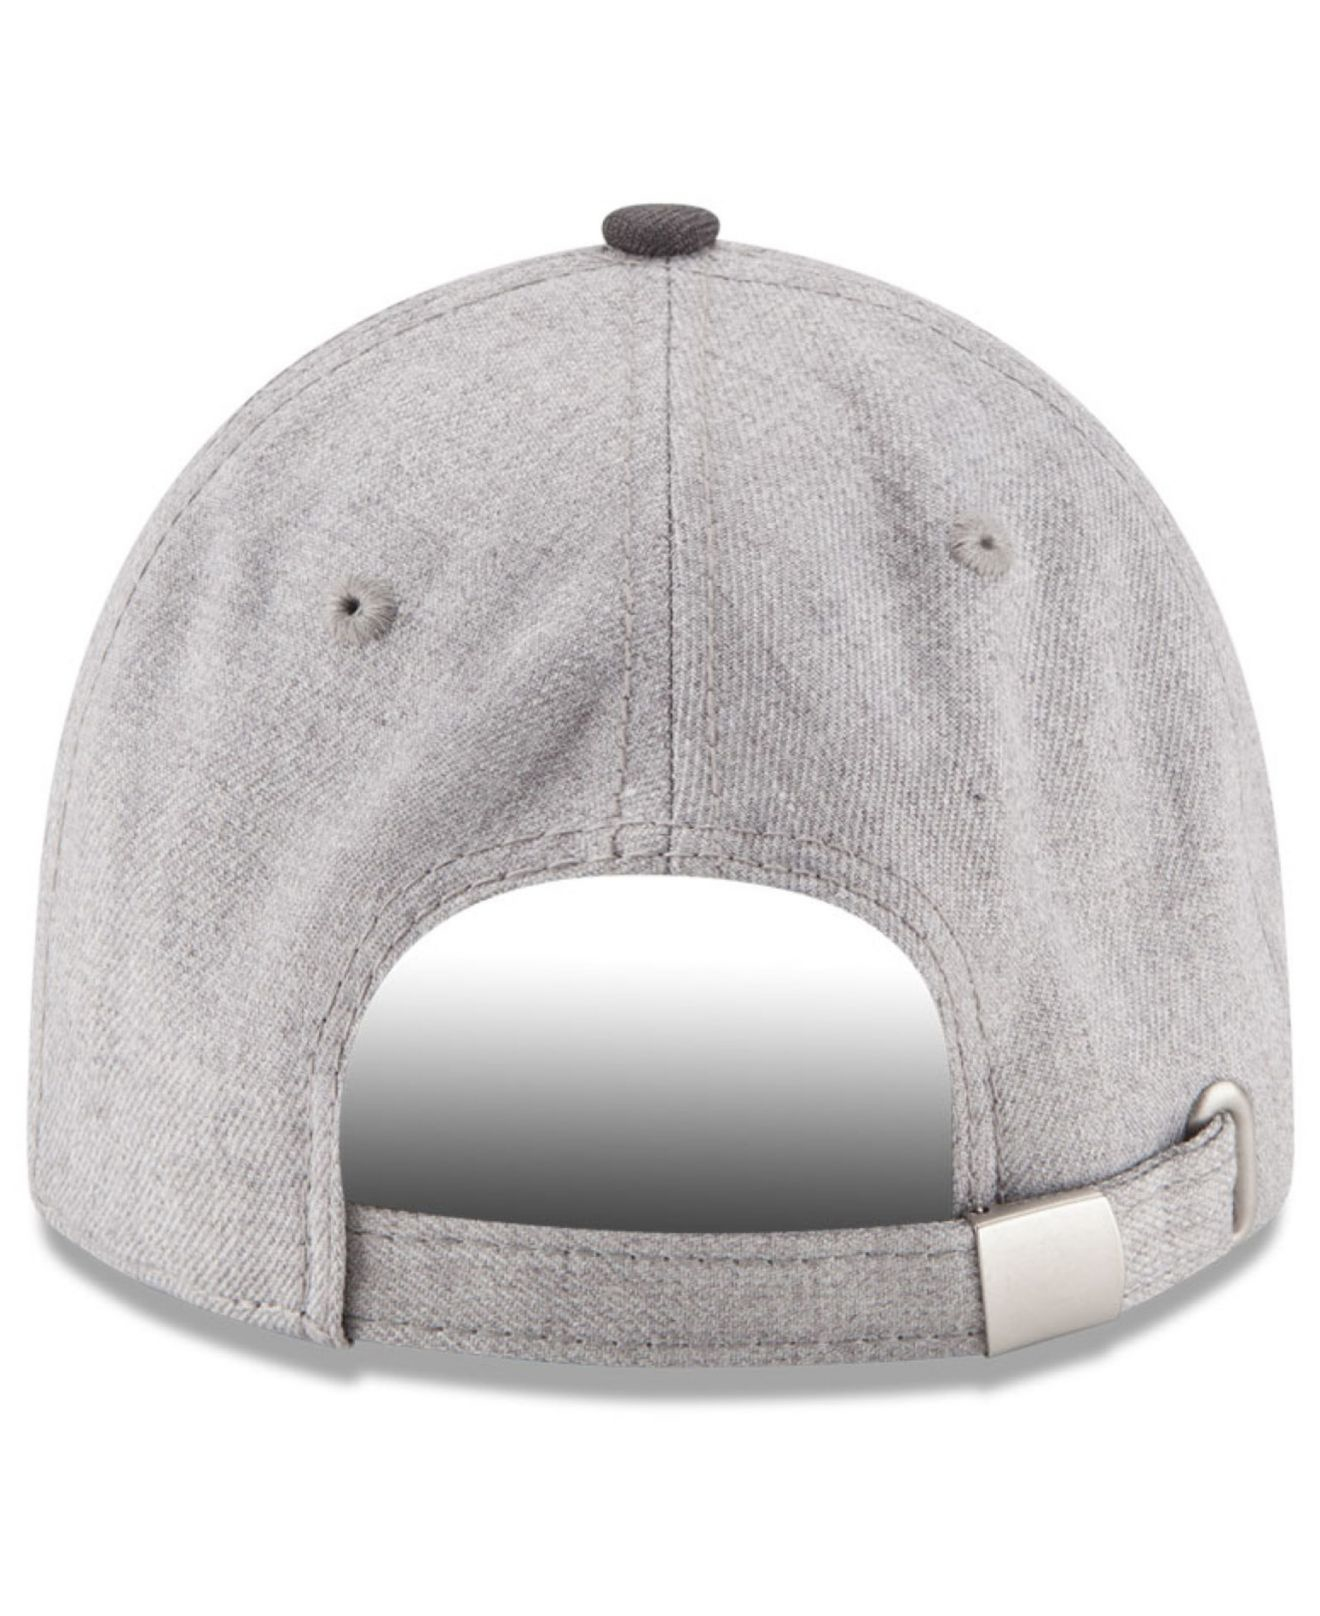 ... hat bf856 spain lyst ktz womens chicago bears breast cancer awareness  9twenty cap a42c1 9f781 ... 7b438ebb702c